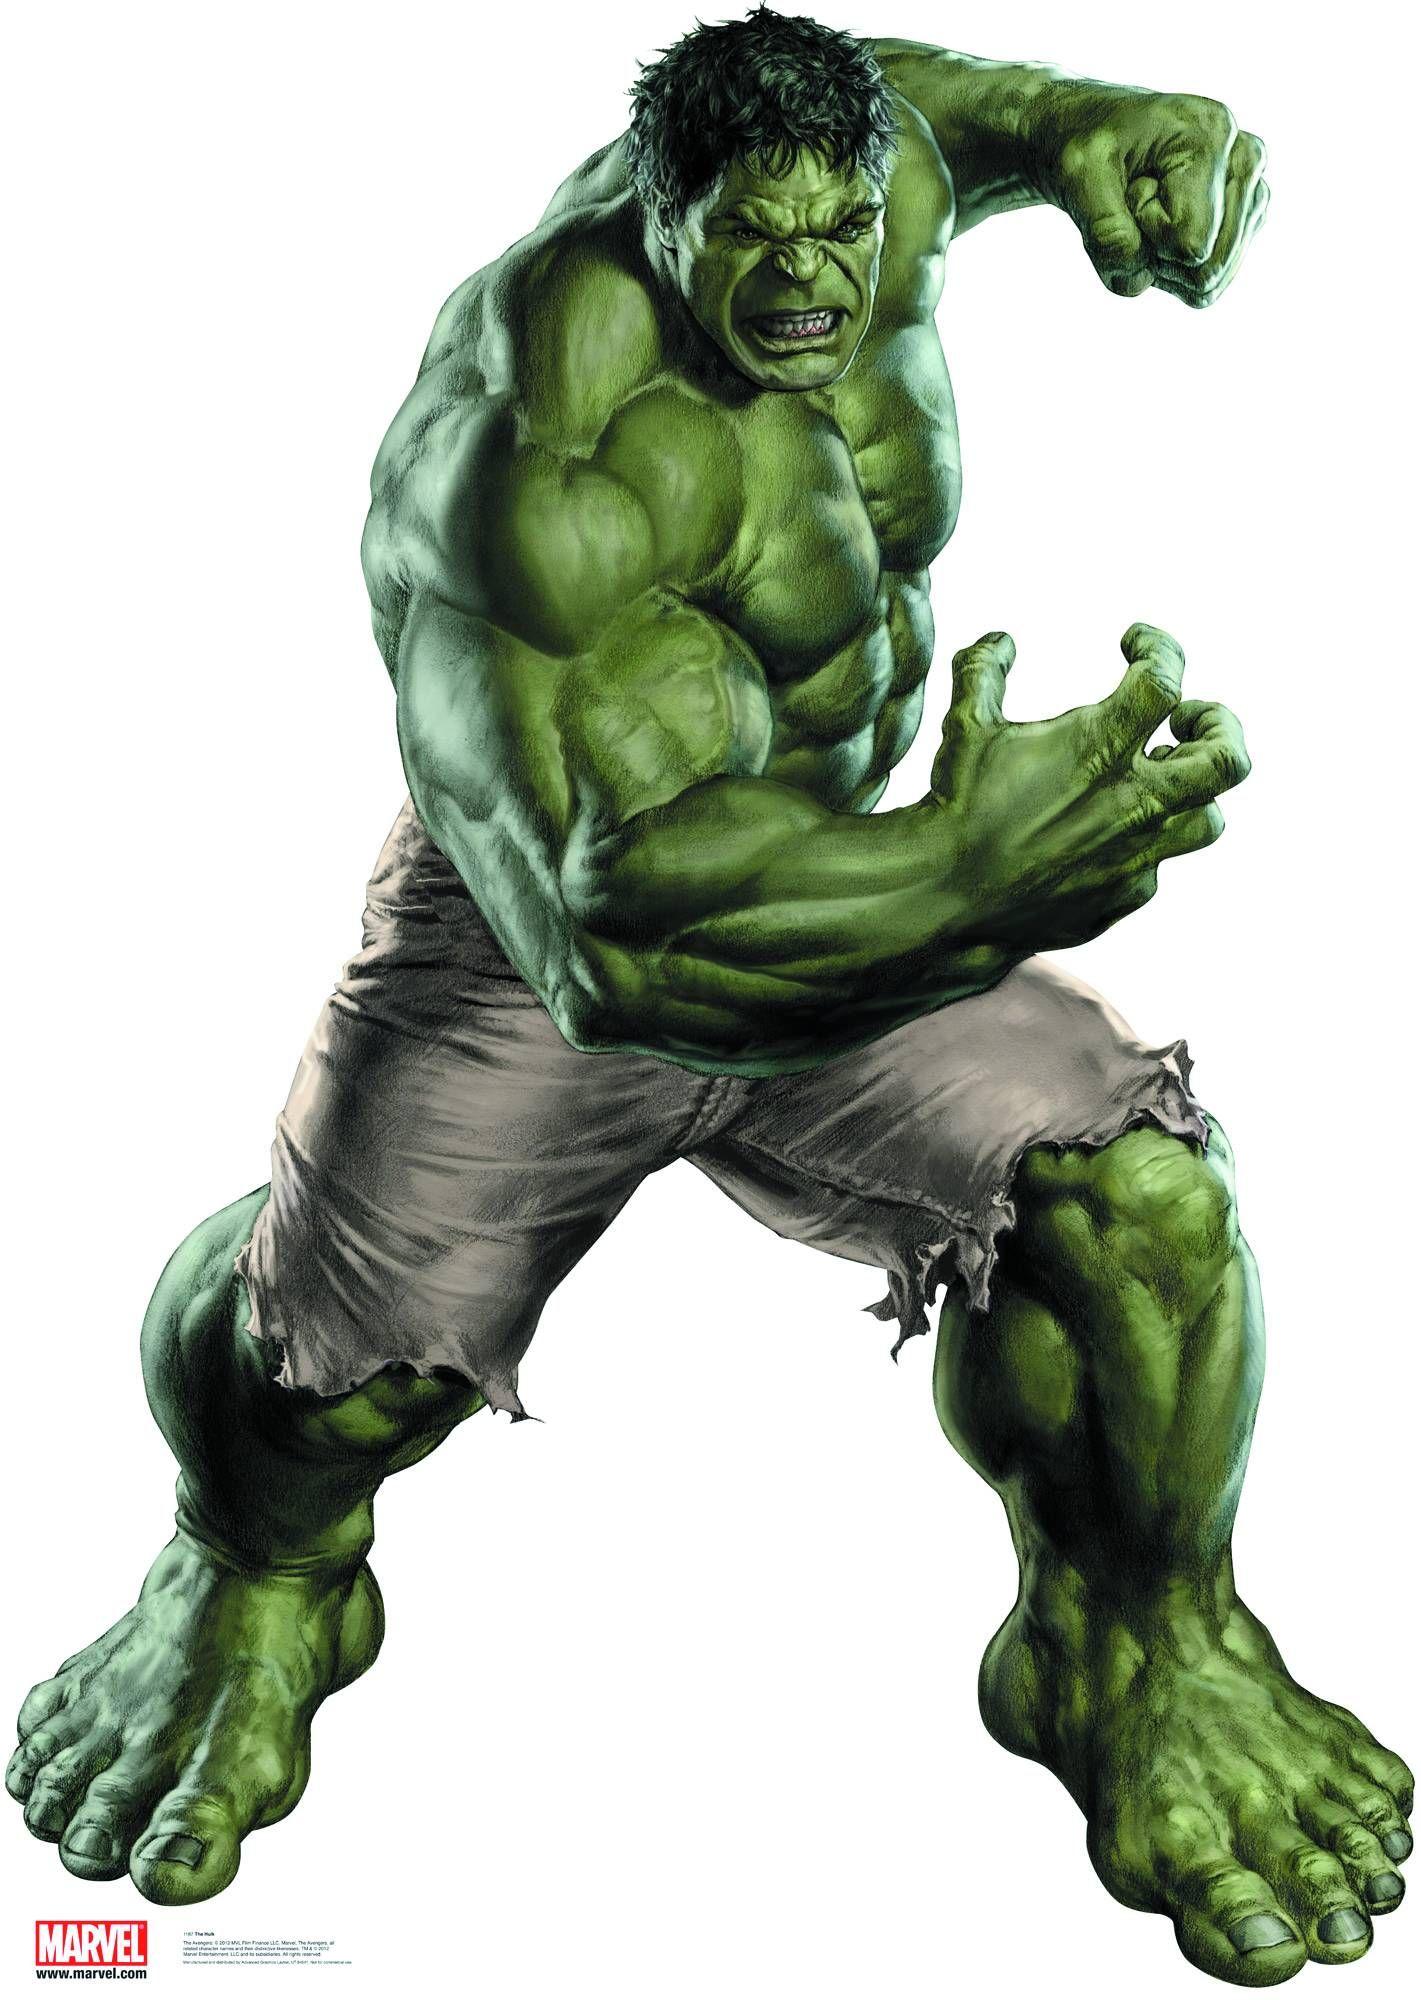 Avengers Cardboard Cutouts Desenho Hulk Incrivel Hulk Vingadores